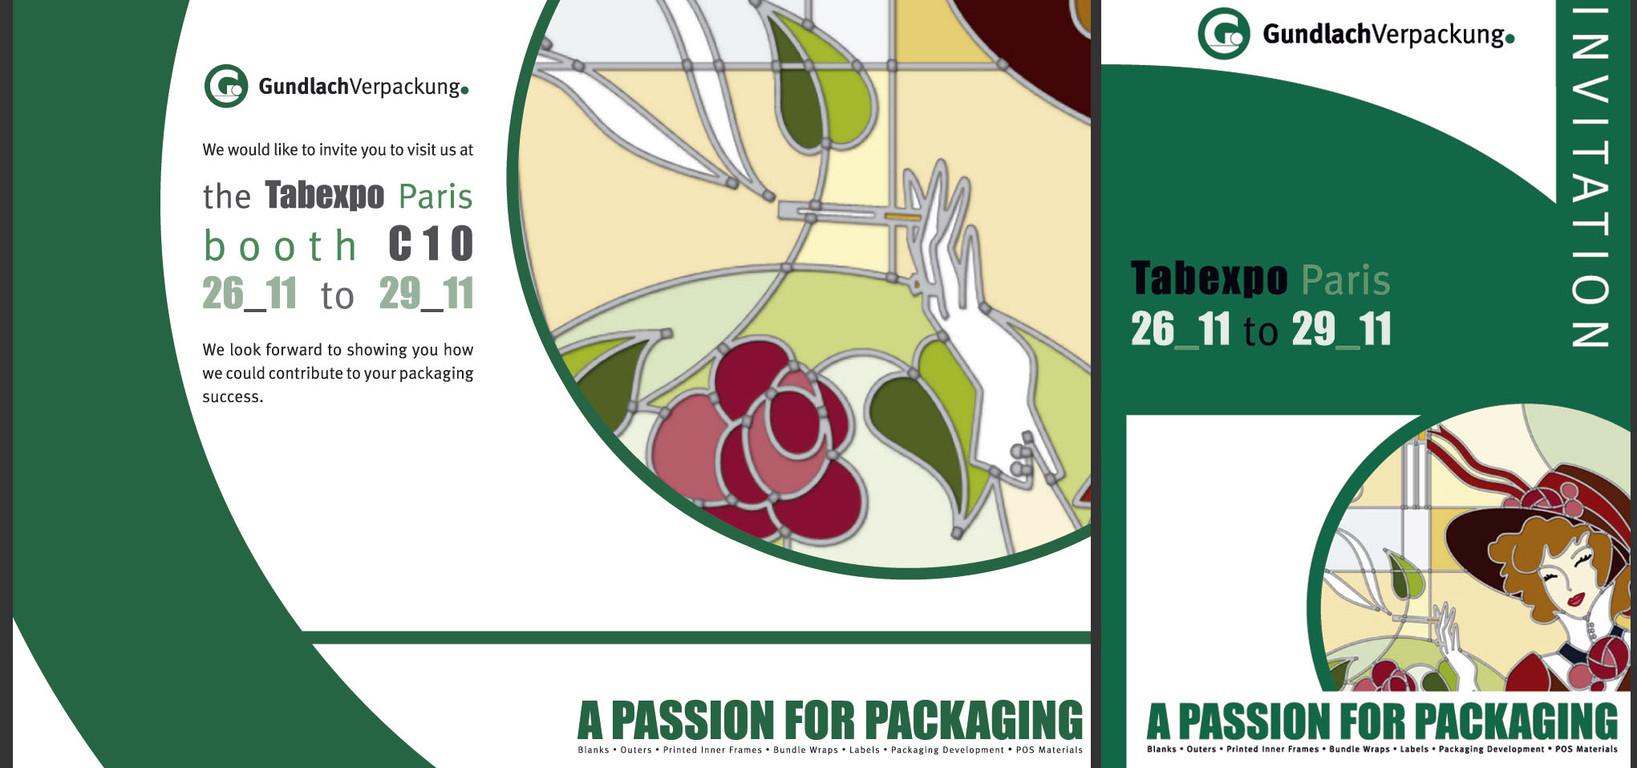 Int. Messe-Einladung Gundlach Verpackung